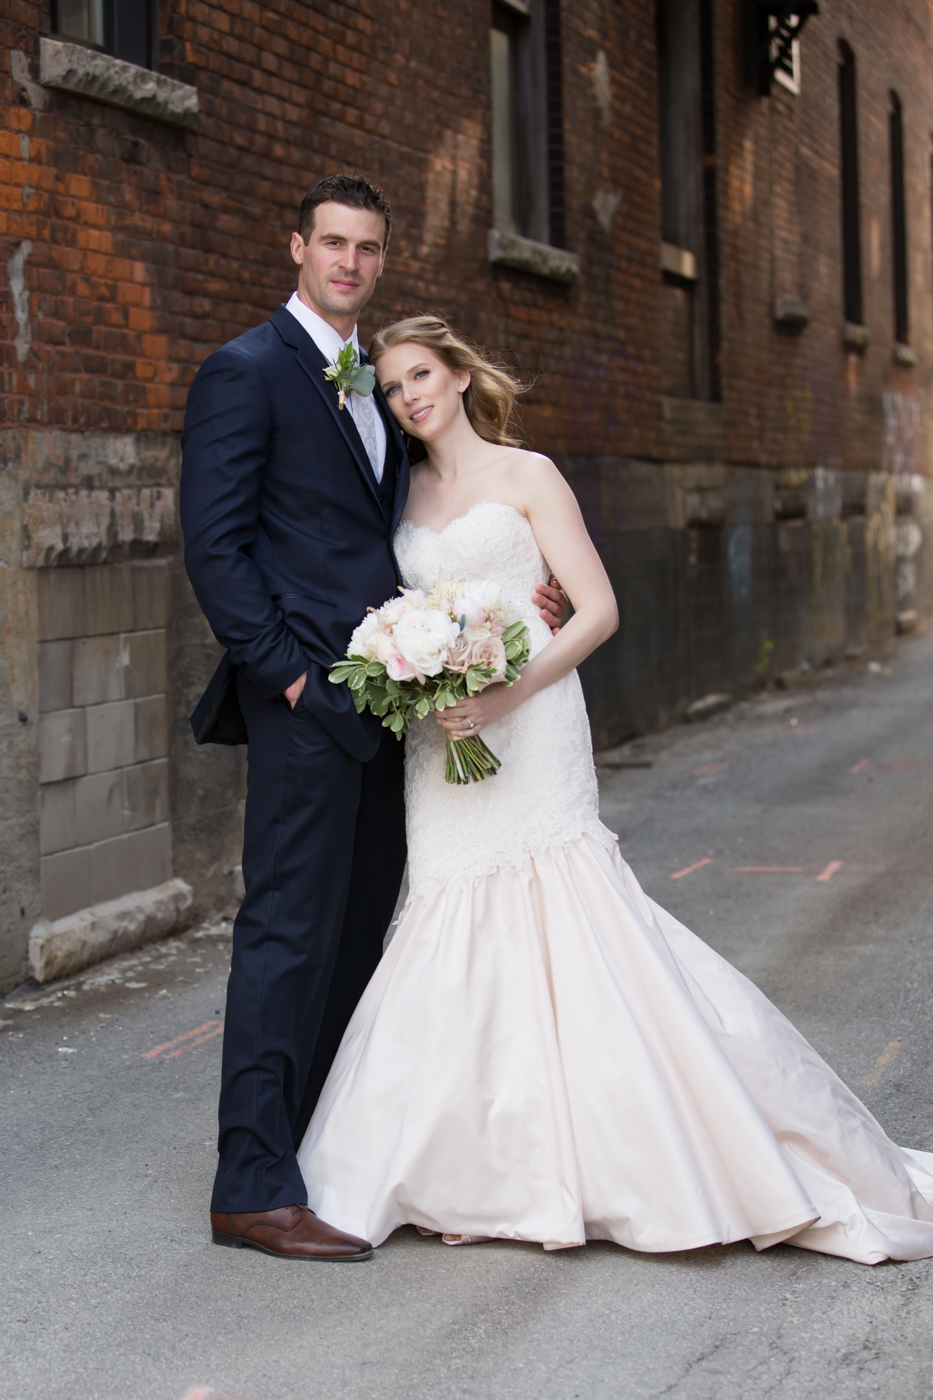 MrMrsKragten_Bride+Groom_Allison Clark Photography-115